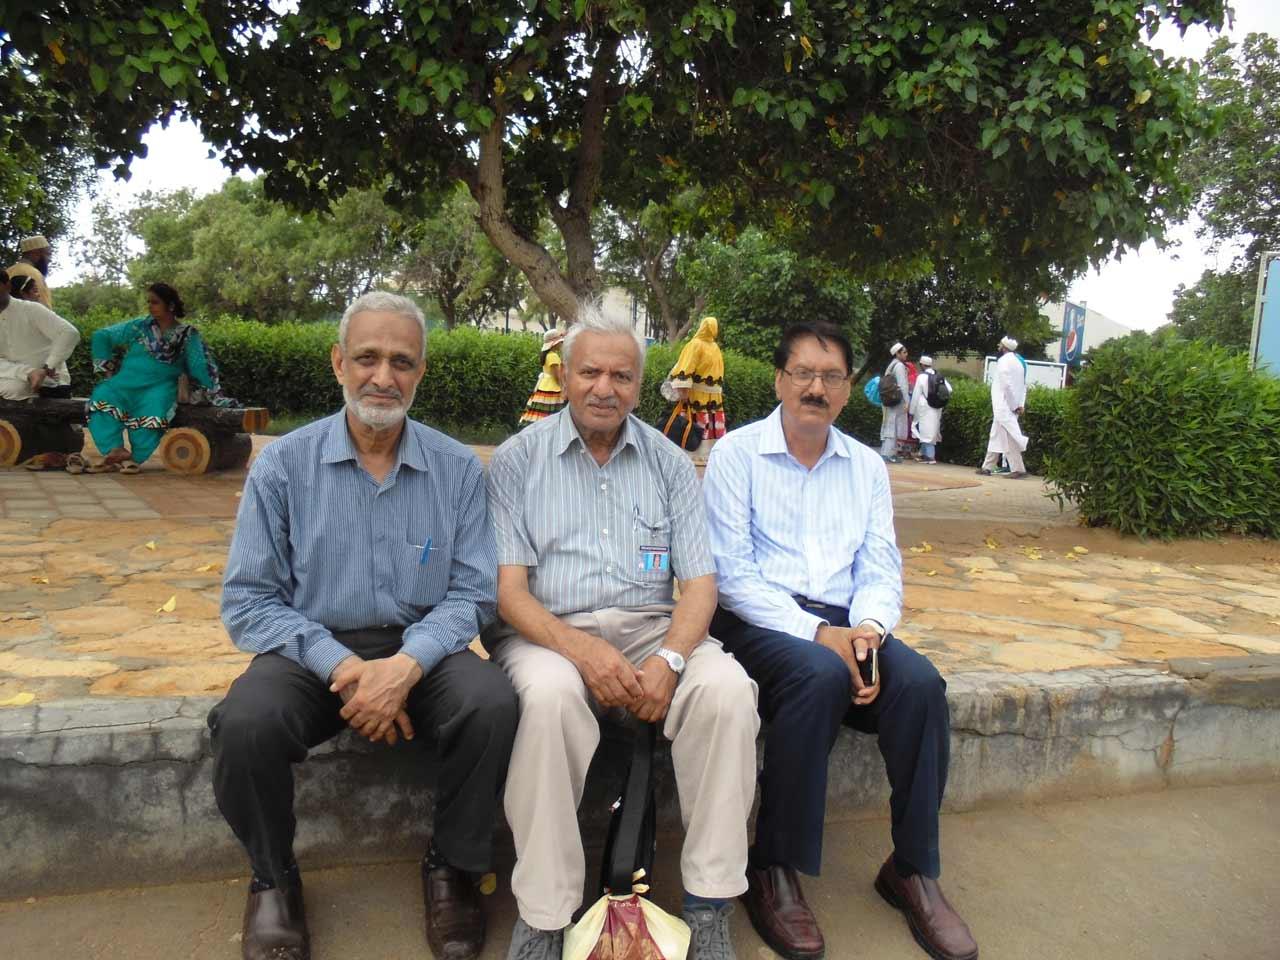 Qazi A. Naseer, Ghulam Qutubuddin Khan, Dr. Syed Maqbool Hussain